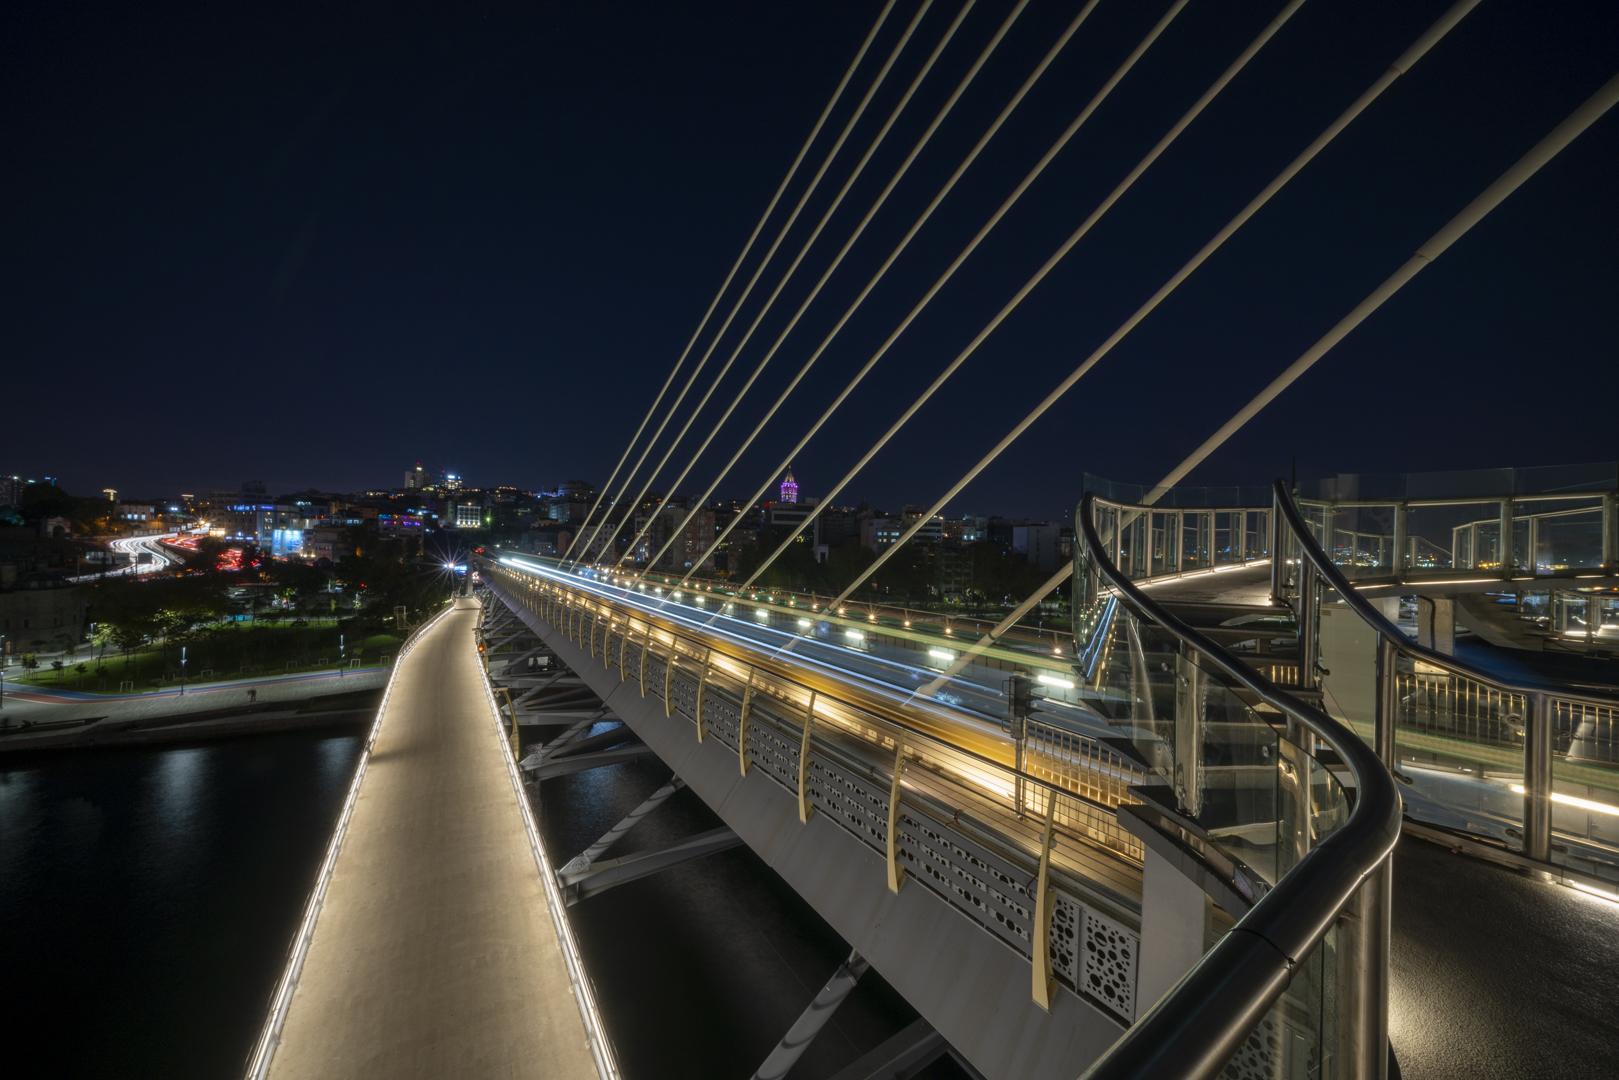 Architekturfotografie Brücke Istanbul Nacht von Fotograf Michael Pinzolits